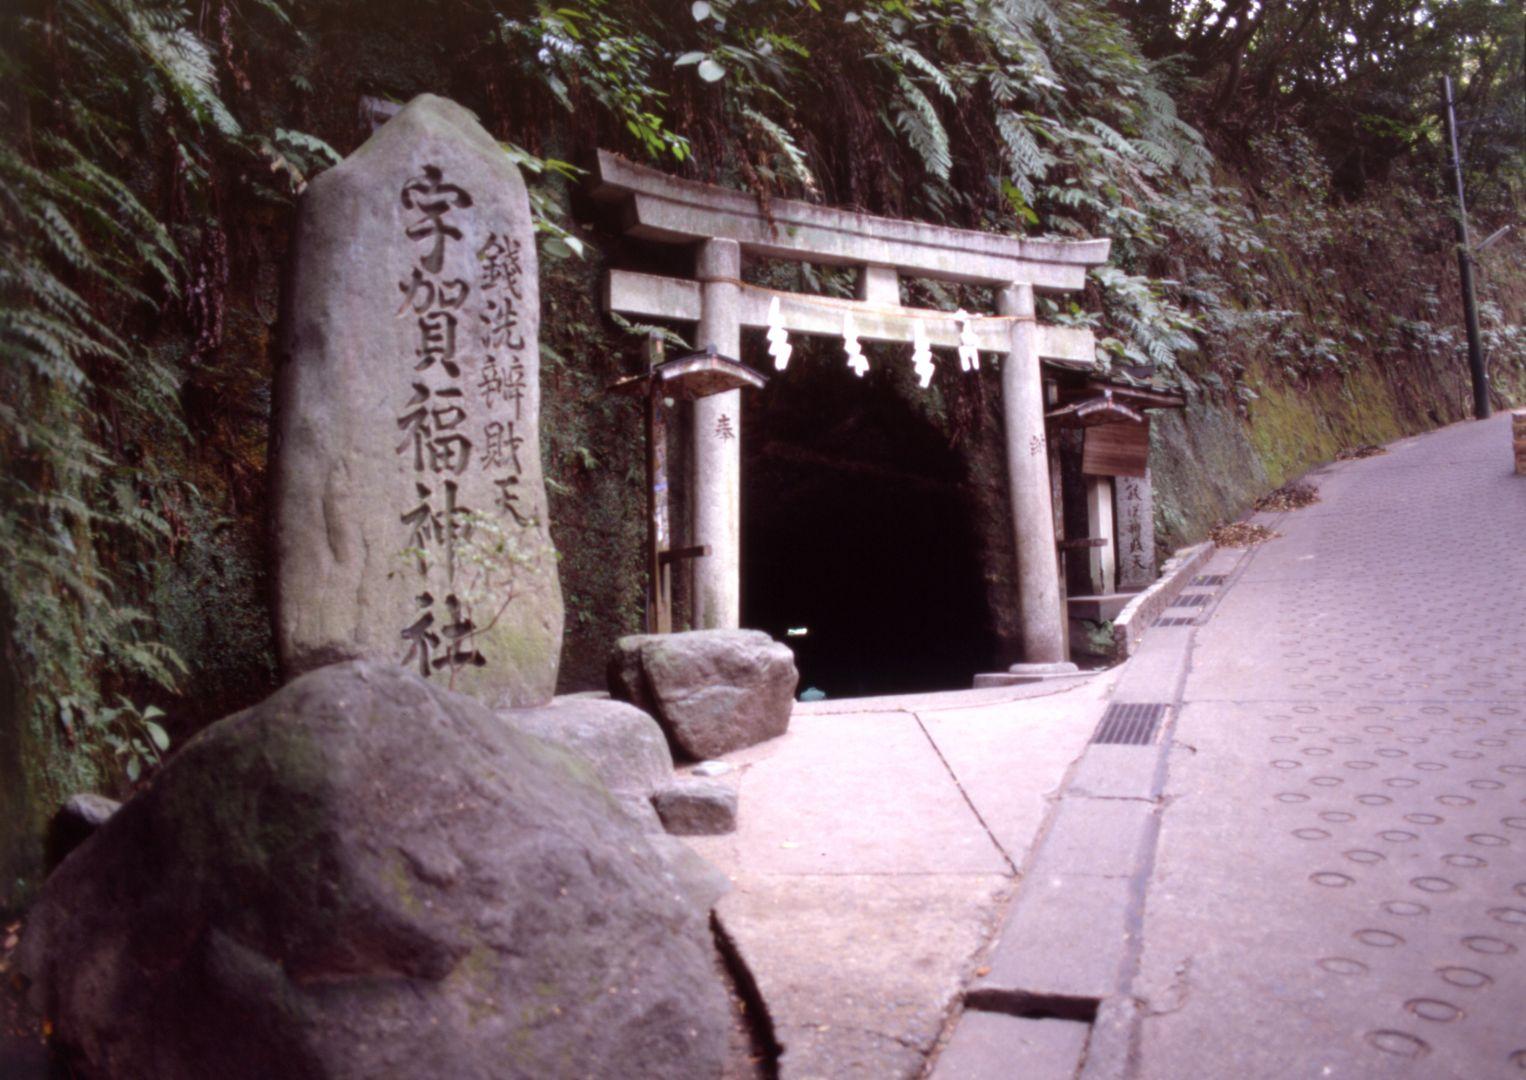 Wash Money for Increased Fortune!?  Popular Shrine for Money Luck - Zeniarai Benzaiten Shrine (Kanagawa prefecture)